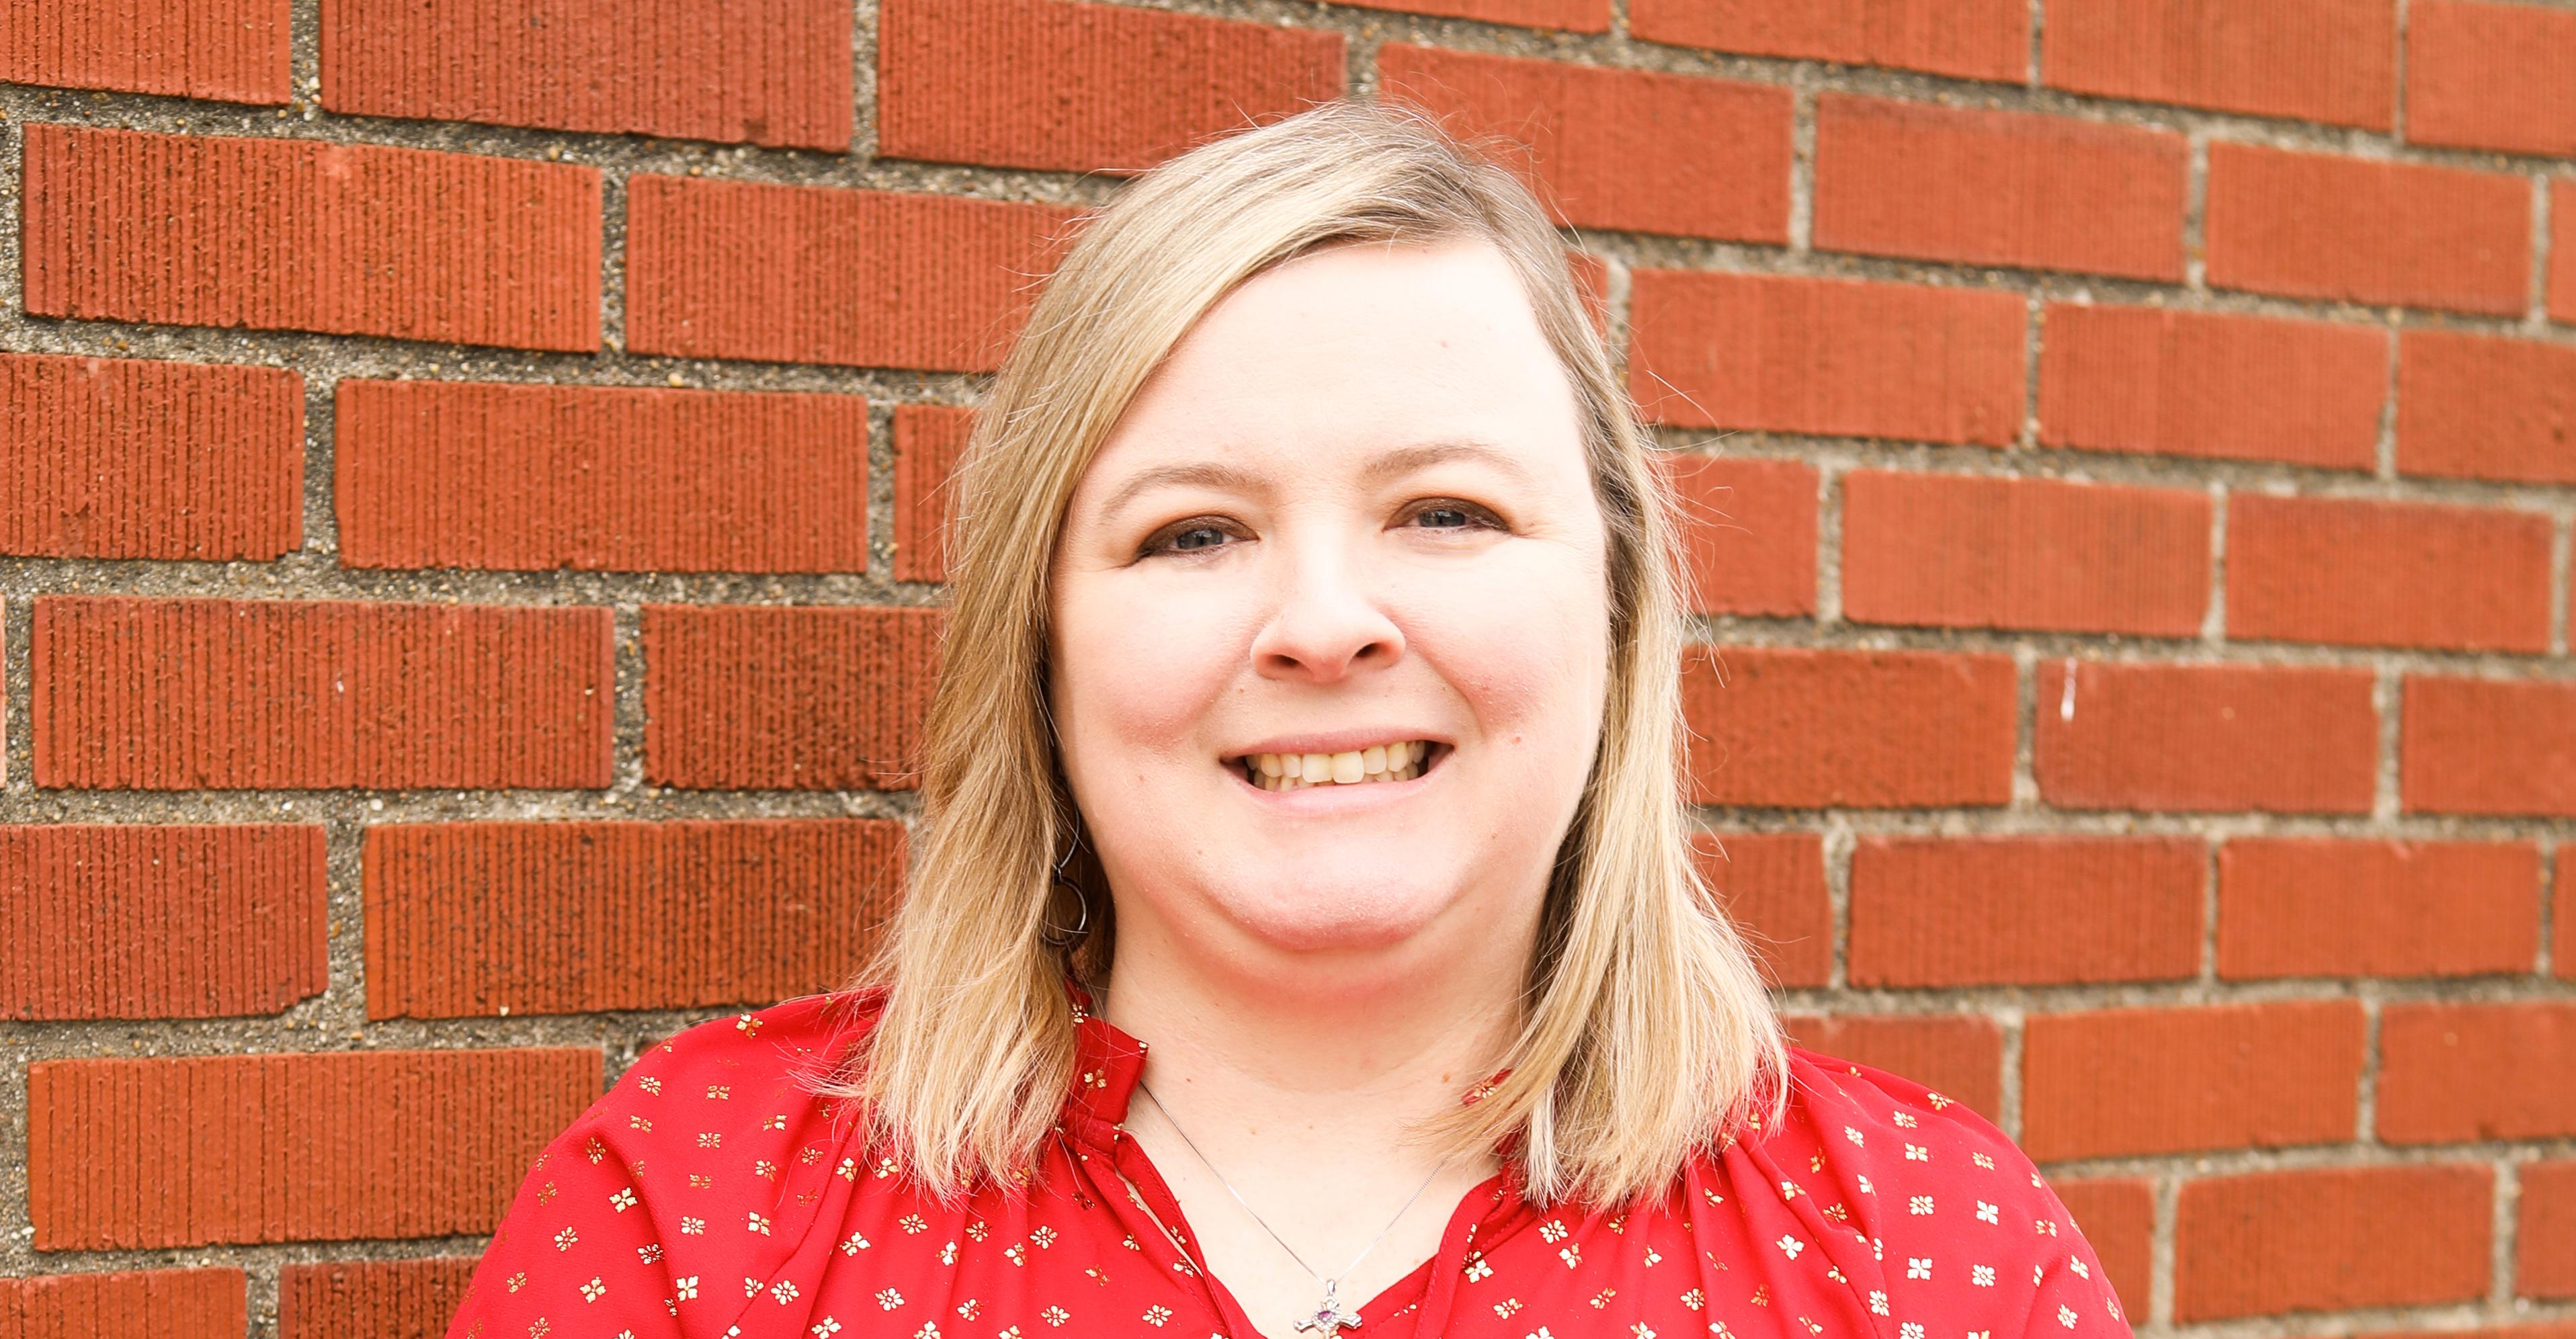 Daphne Sanders Account Manager Van Meter Insurance Owensboro